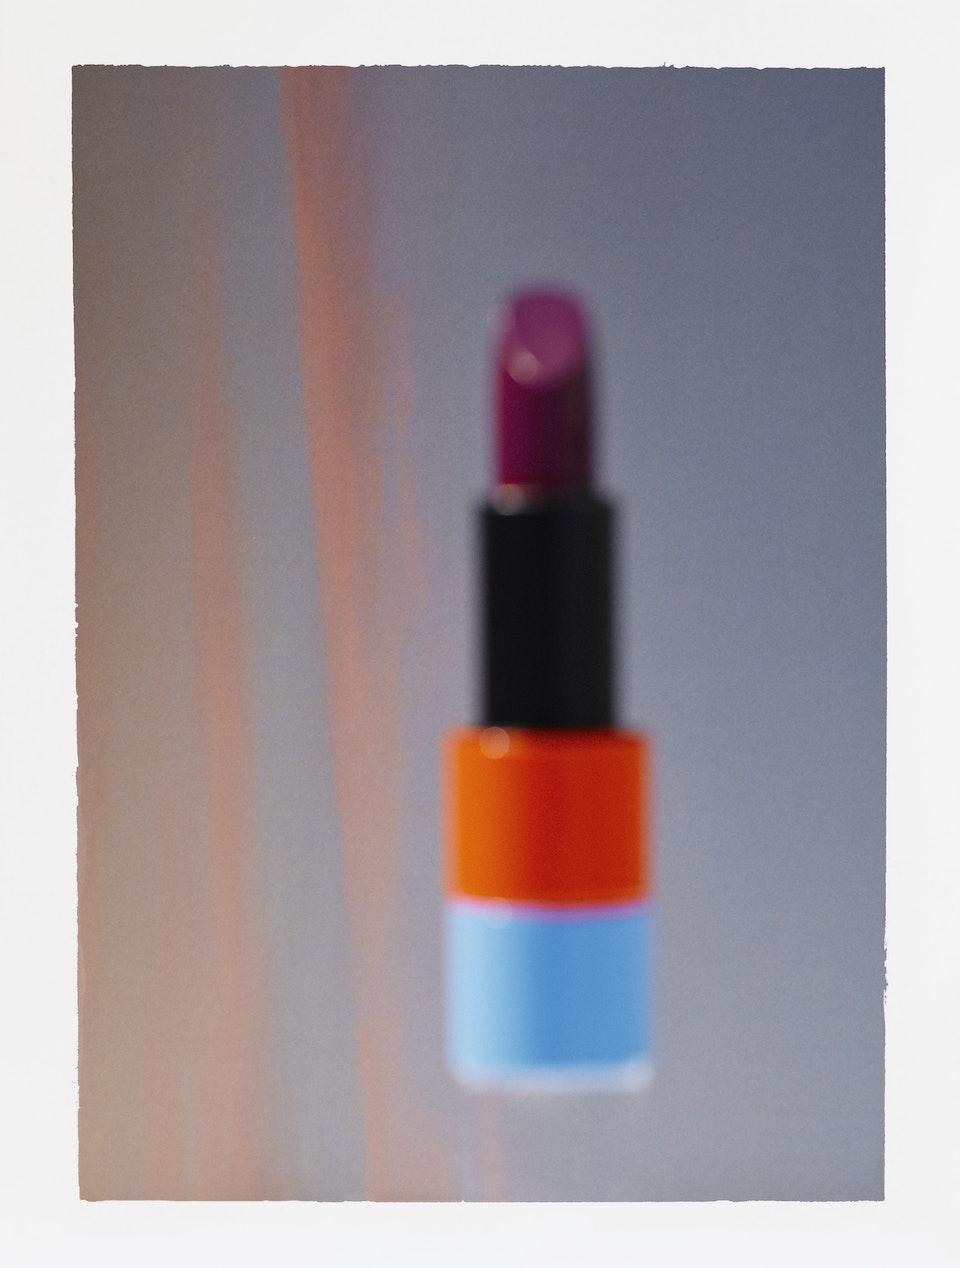 Hermès Liptsick BLOOM_HERMES_RAL_03_POLA